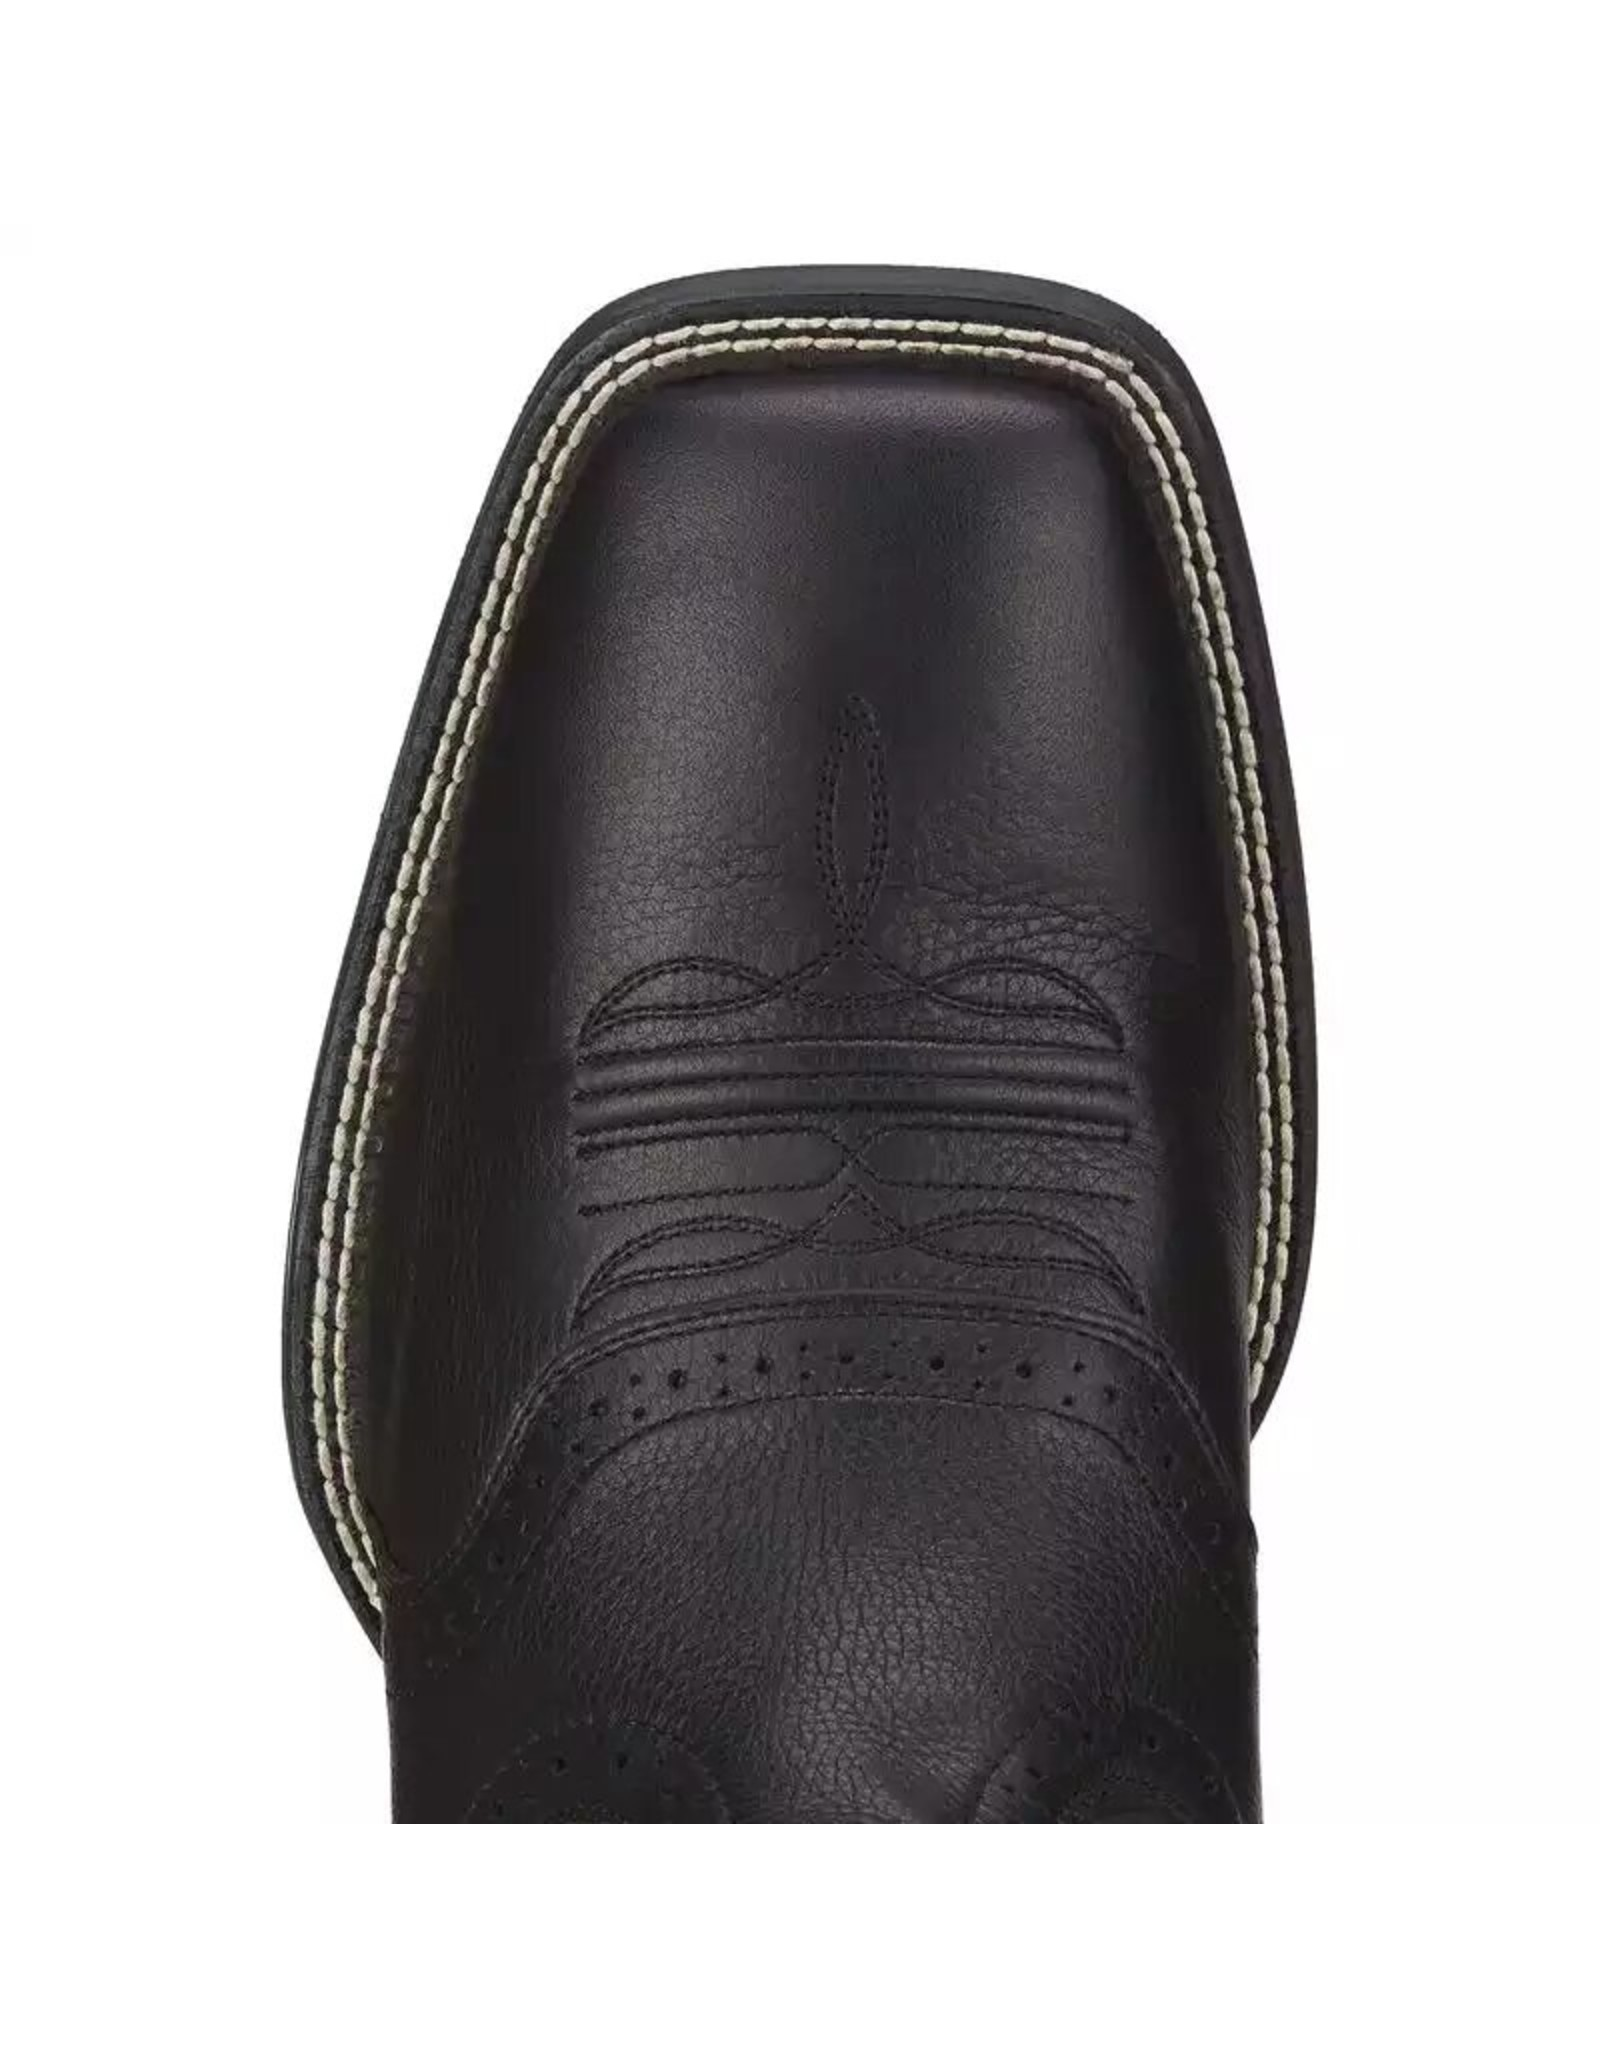 Boots-Men ARIAT 10016292 Sport Western Wide Sq